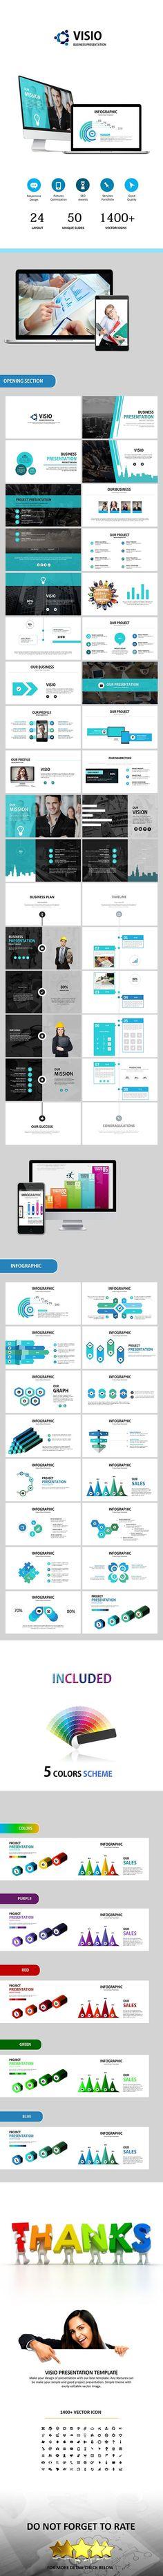 VISIO - Powerpoint Business Presentation (PowerPoint Templates)